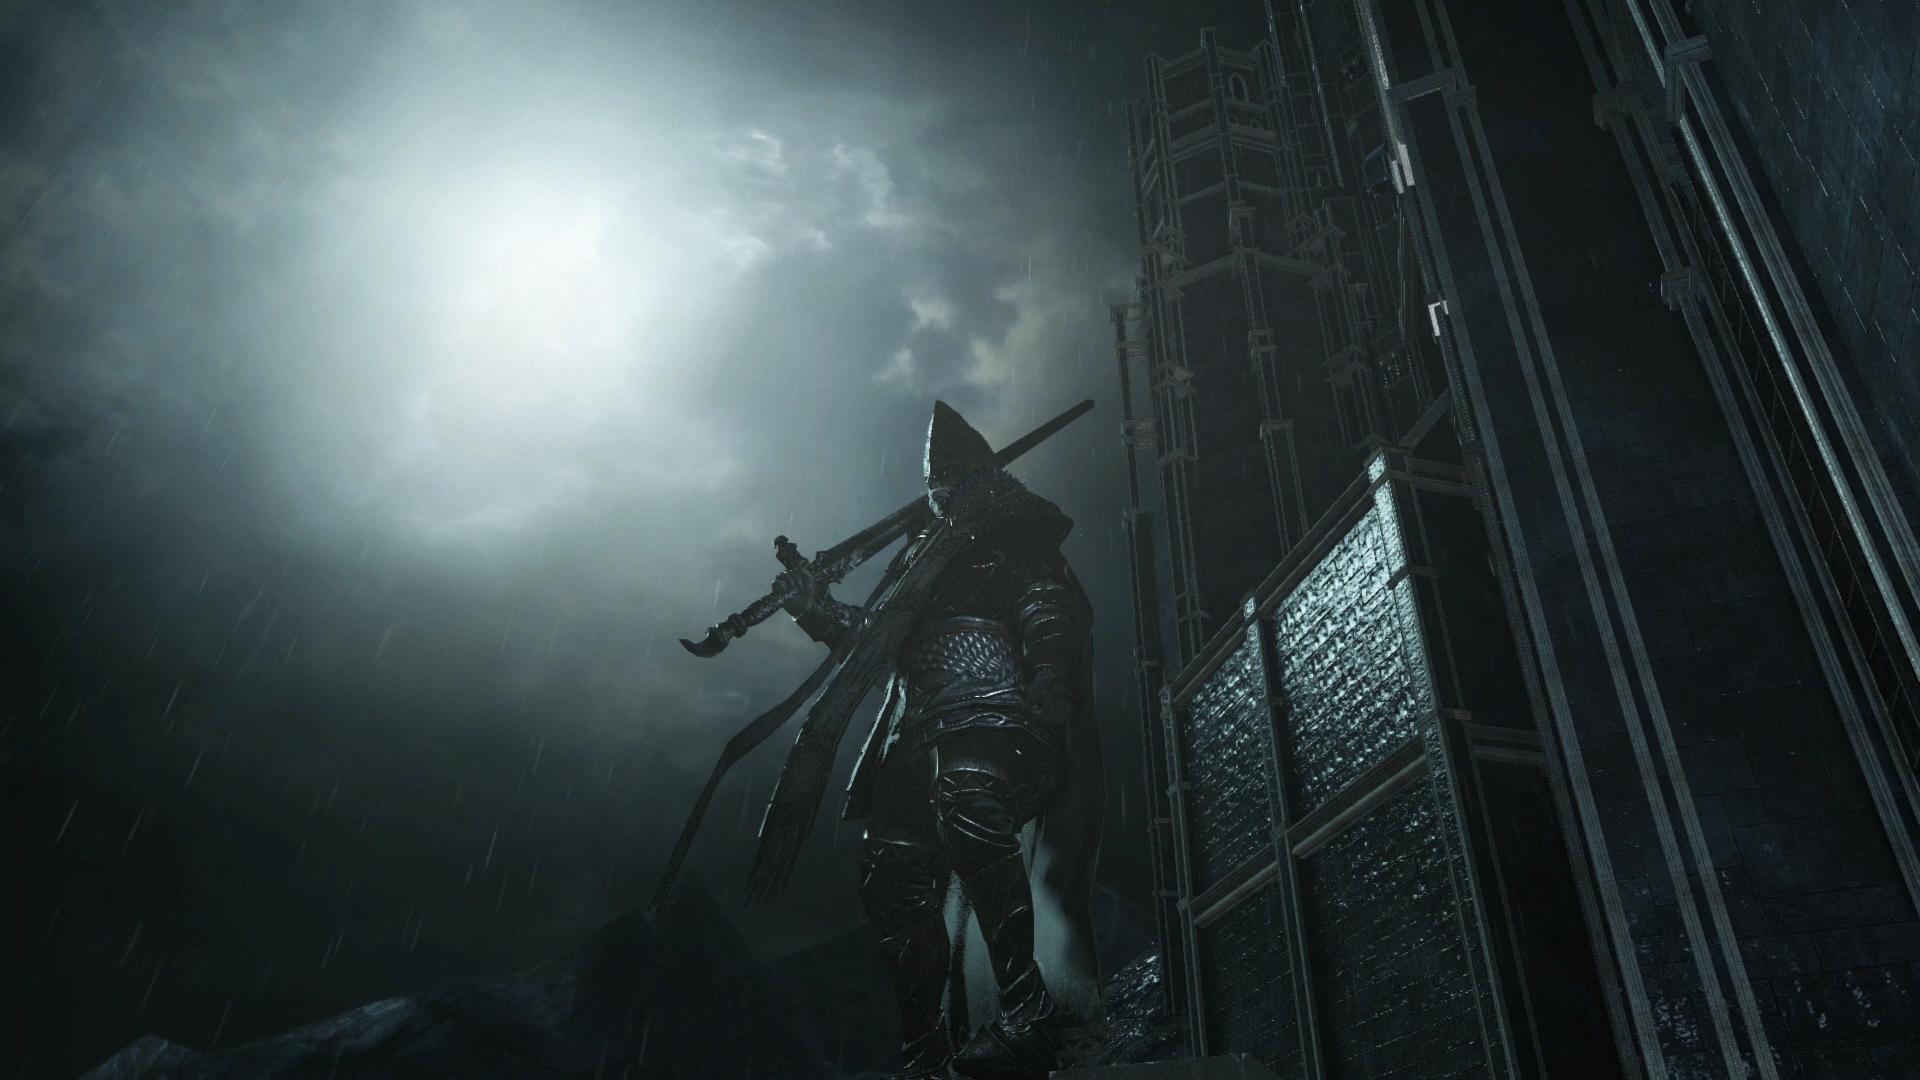 Dark Souls 2 Wallpaper: Dark Souls 3 Animated Wallpaper